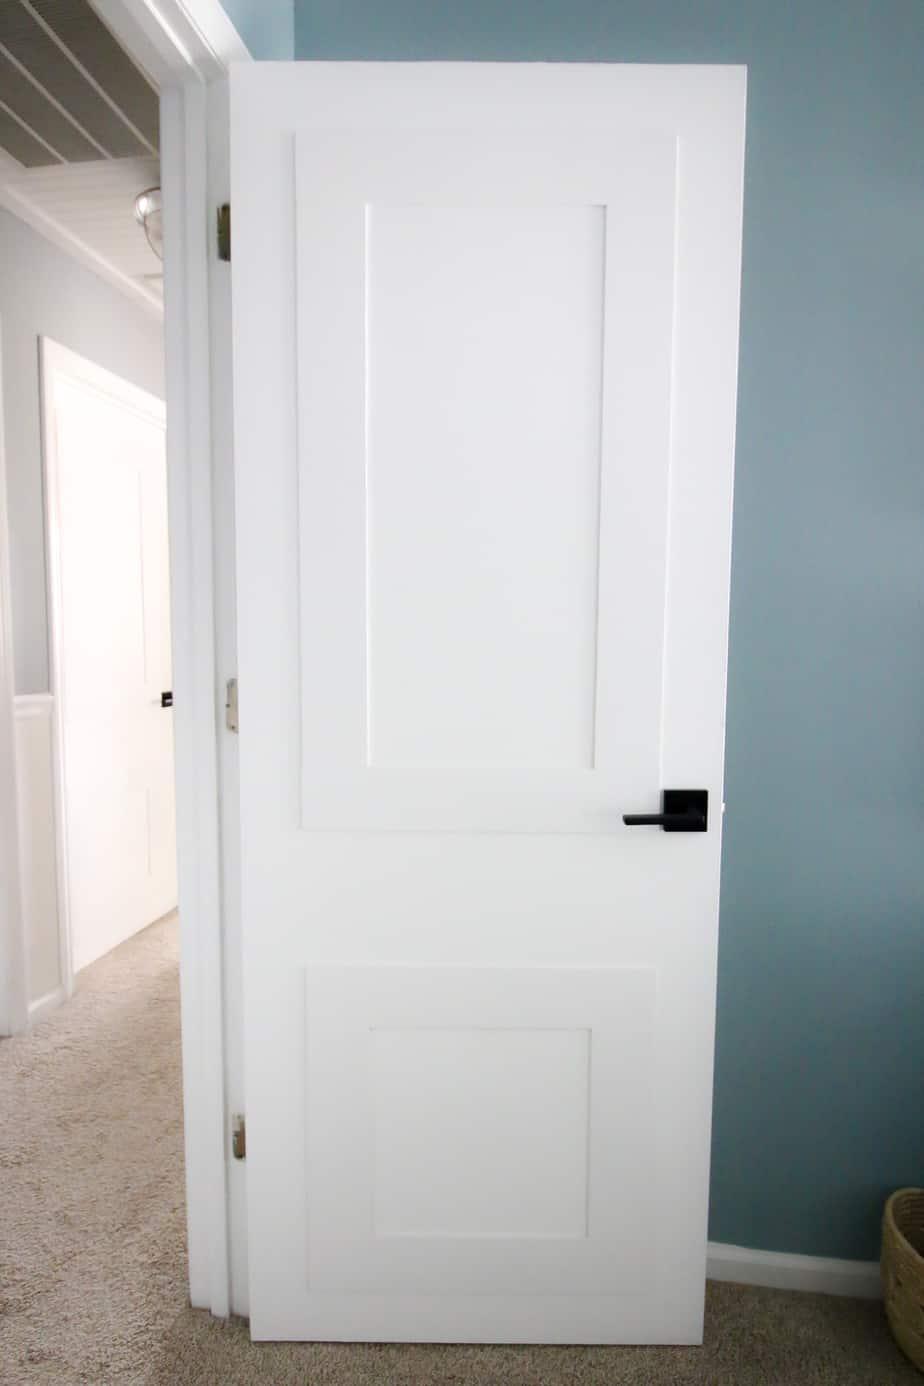 Updating Interior Doors with Molding